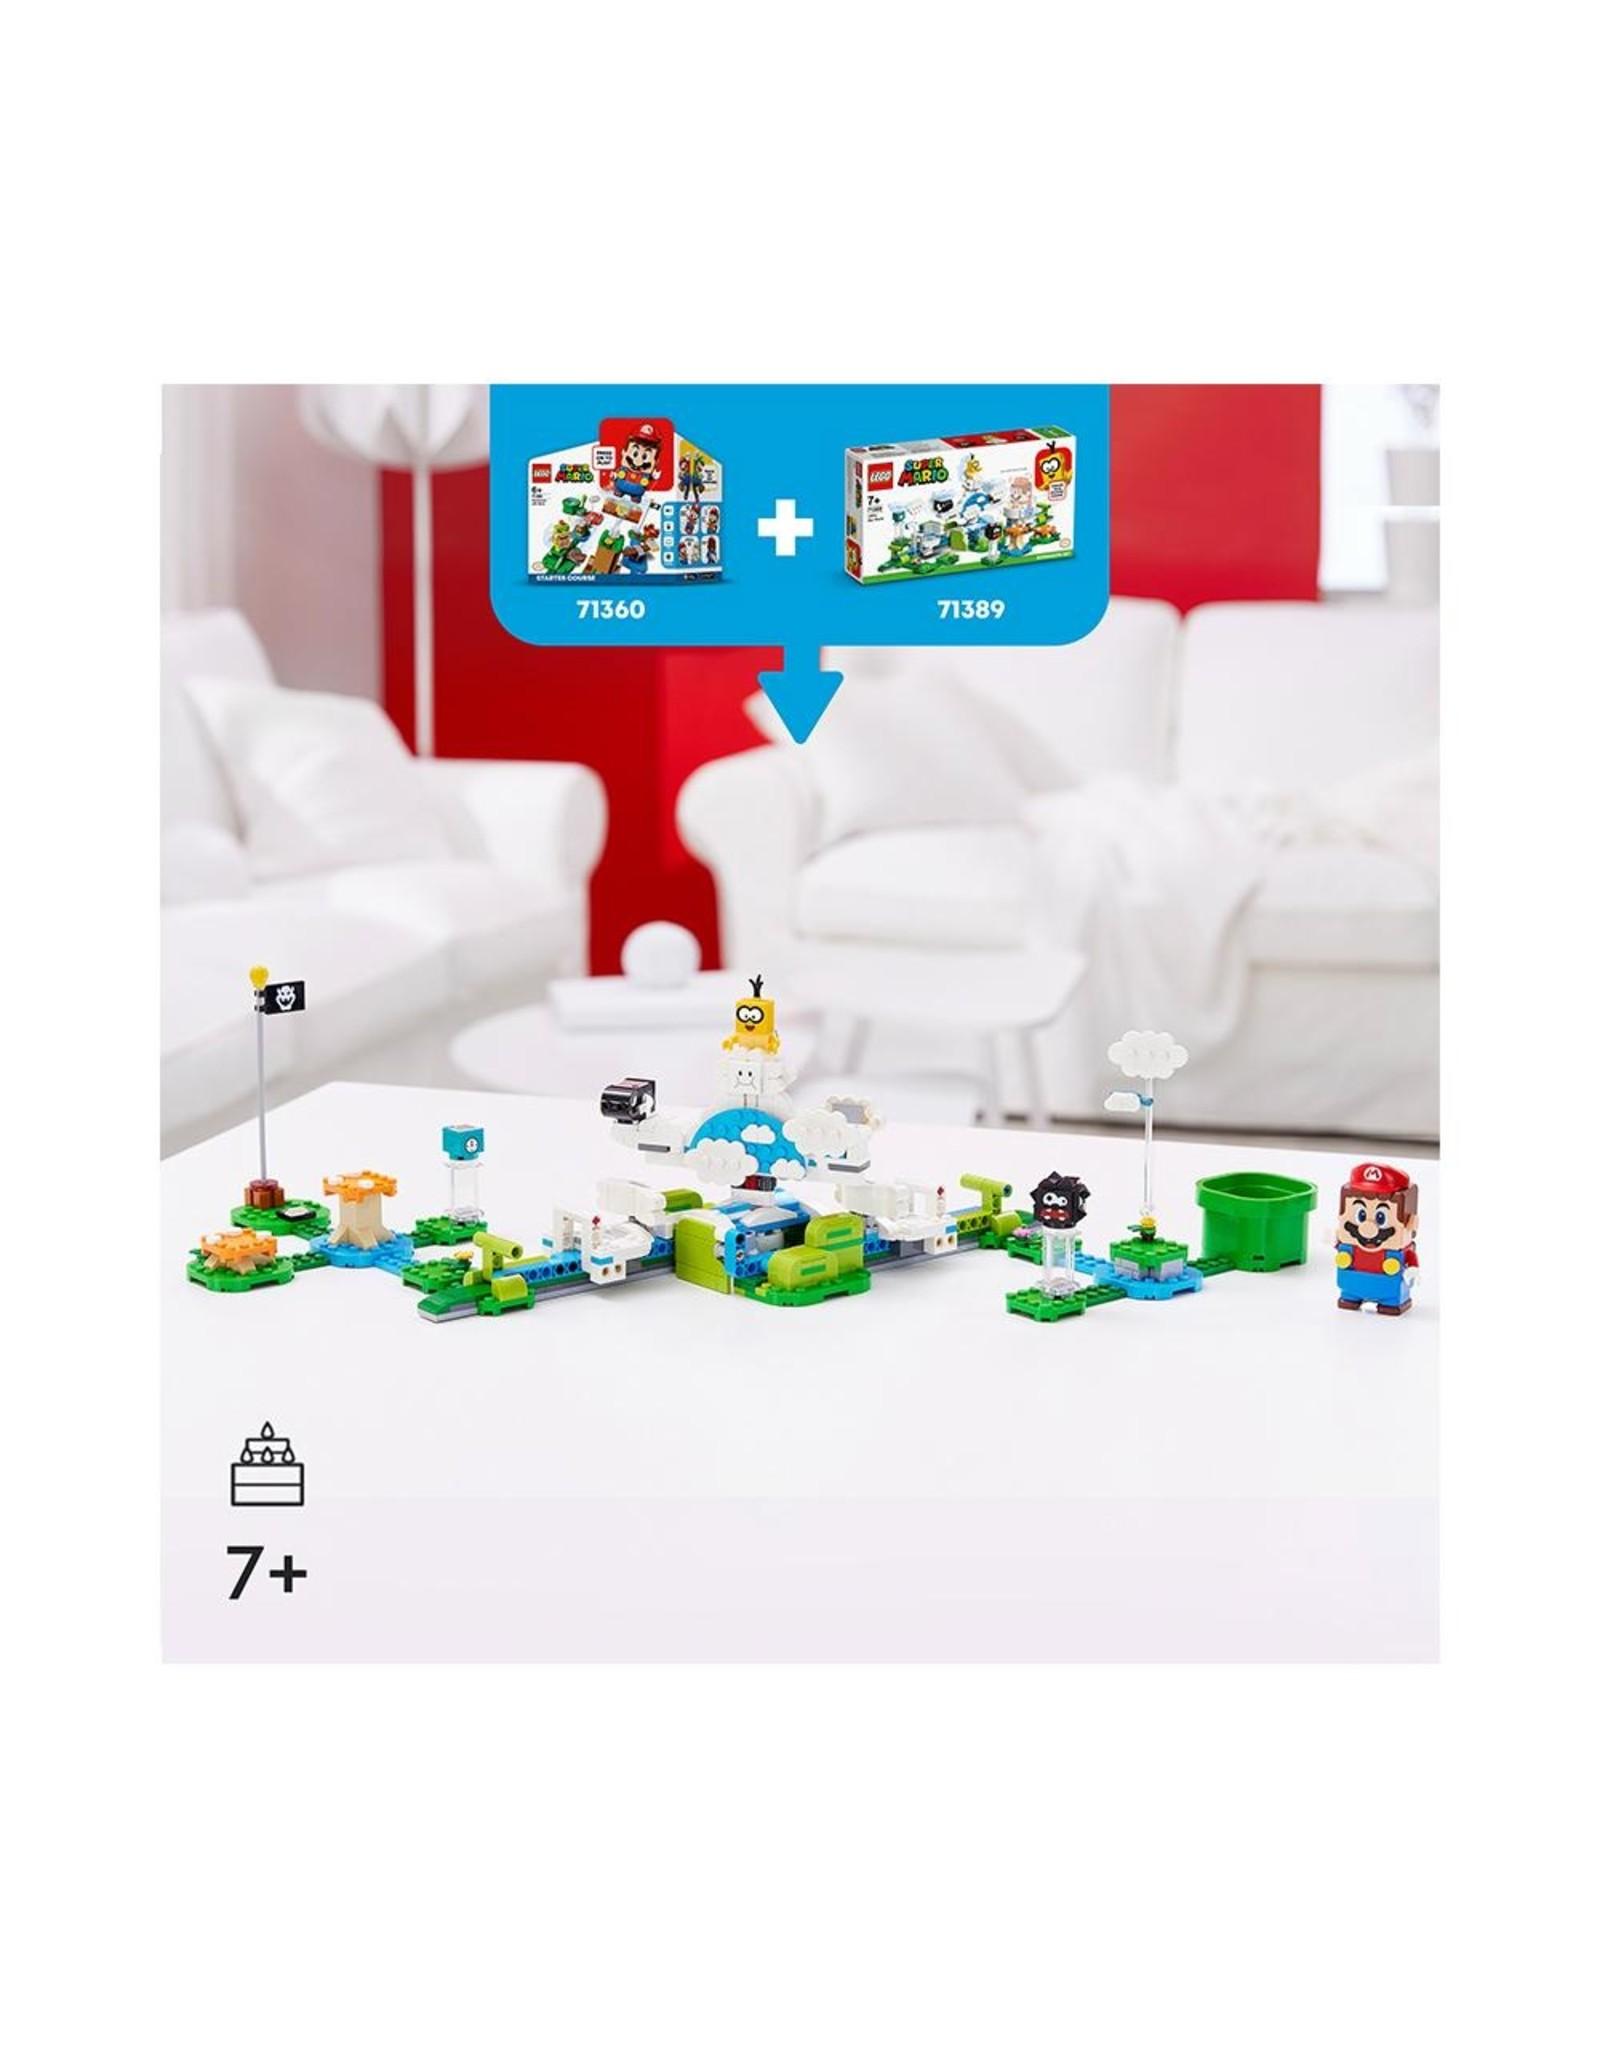 LEGO Super Mario - 71389 Kakitu Sky World Expansion Set